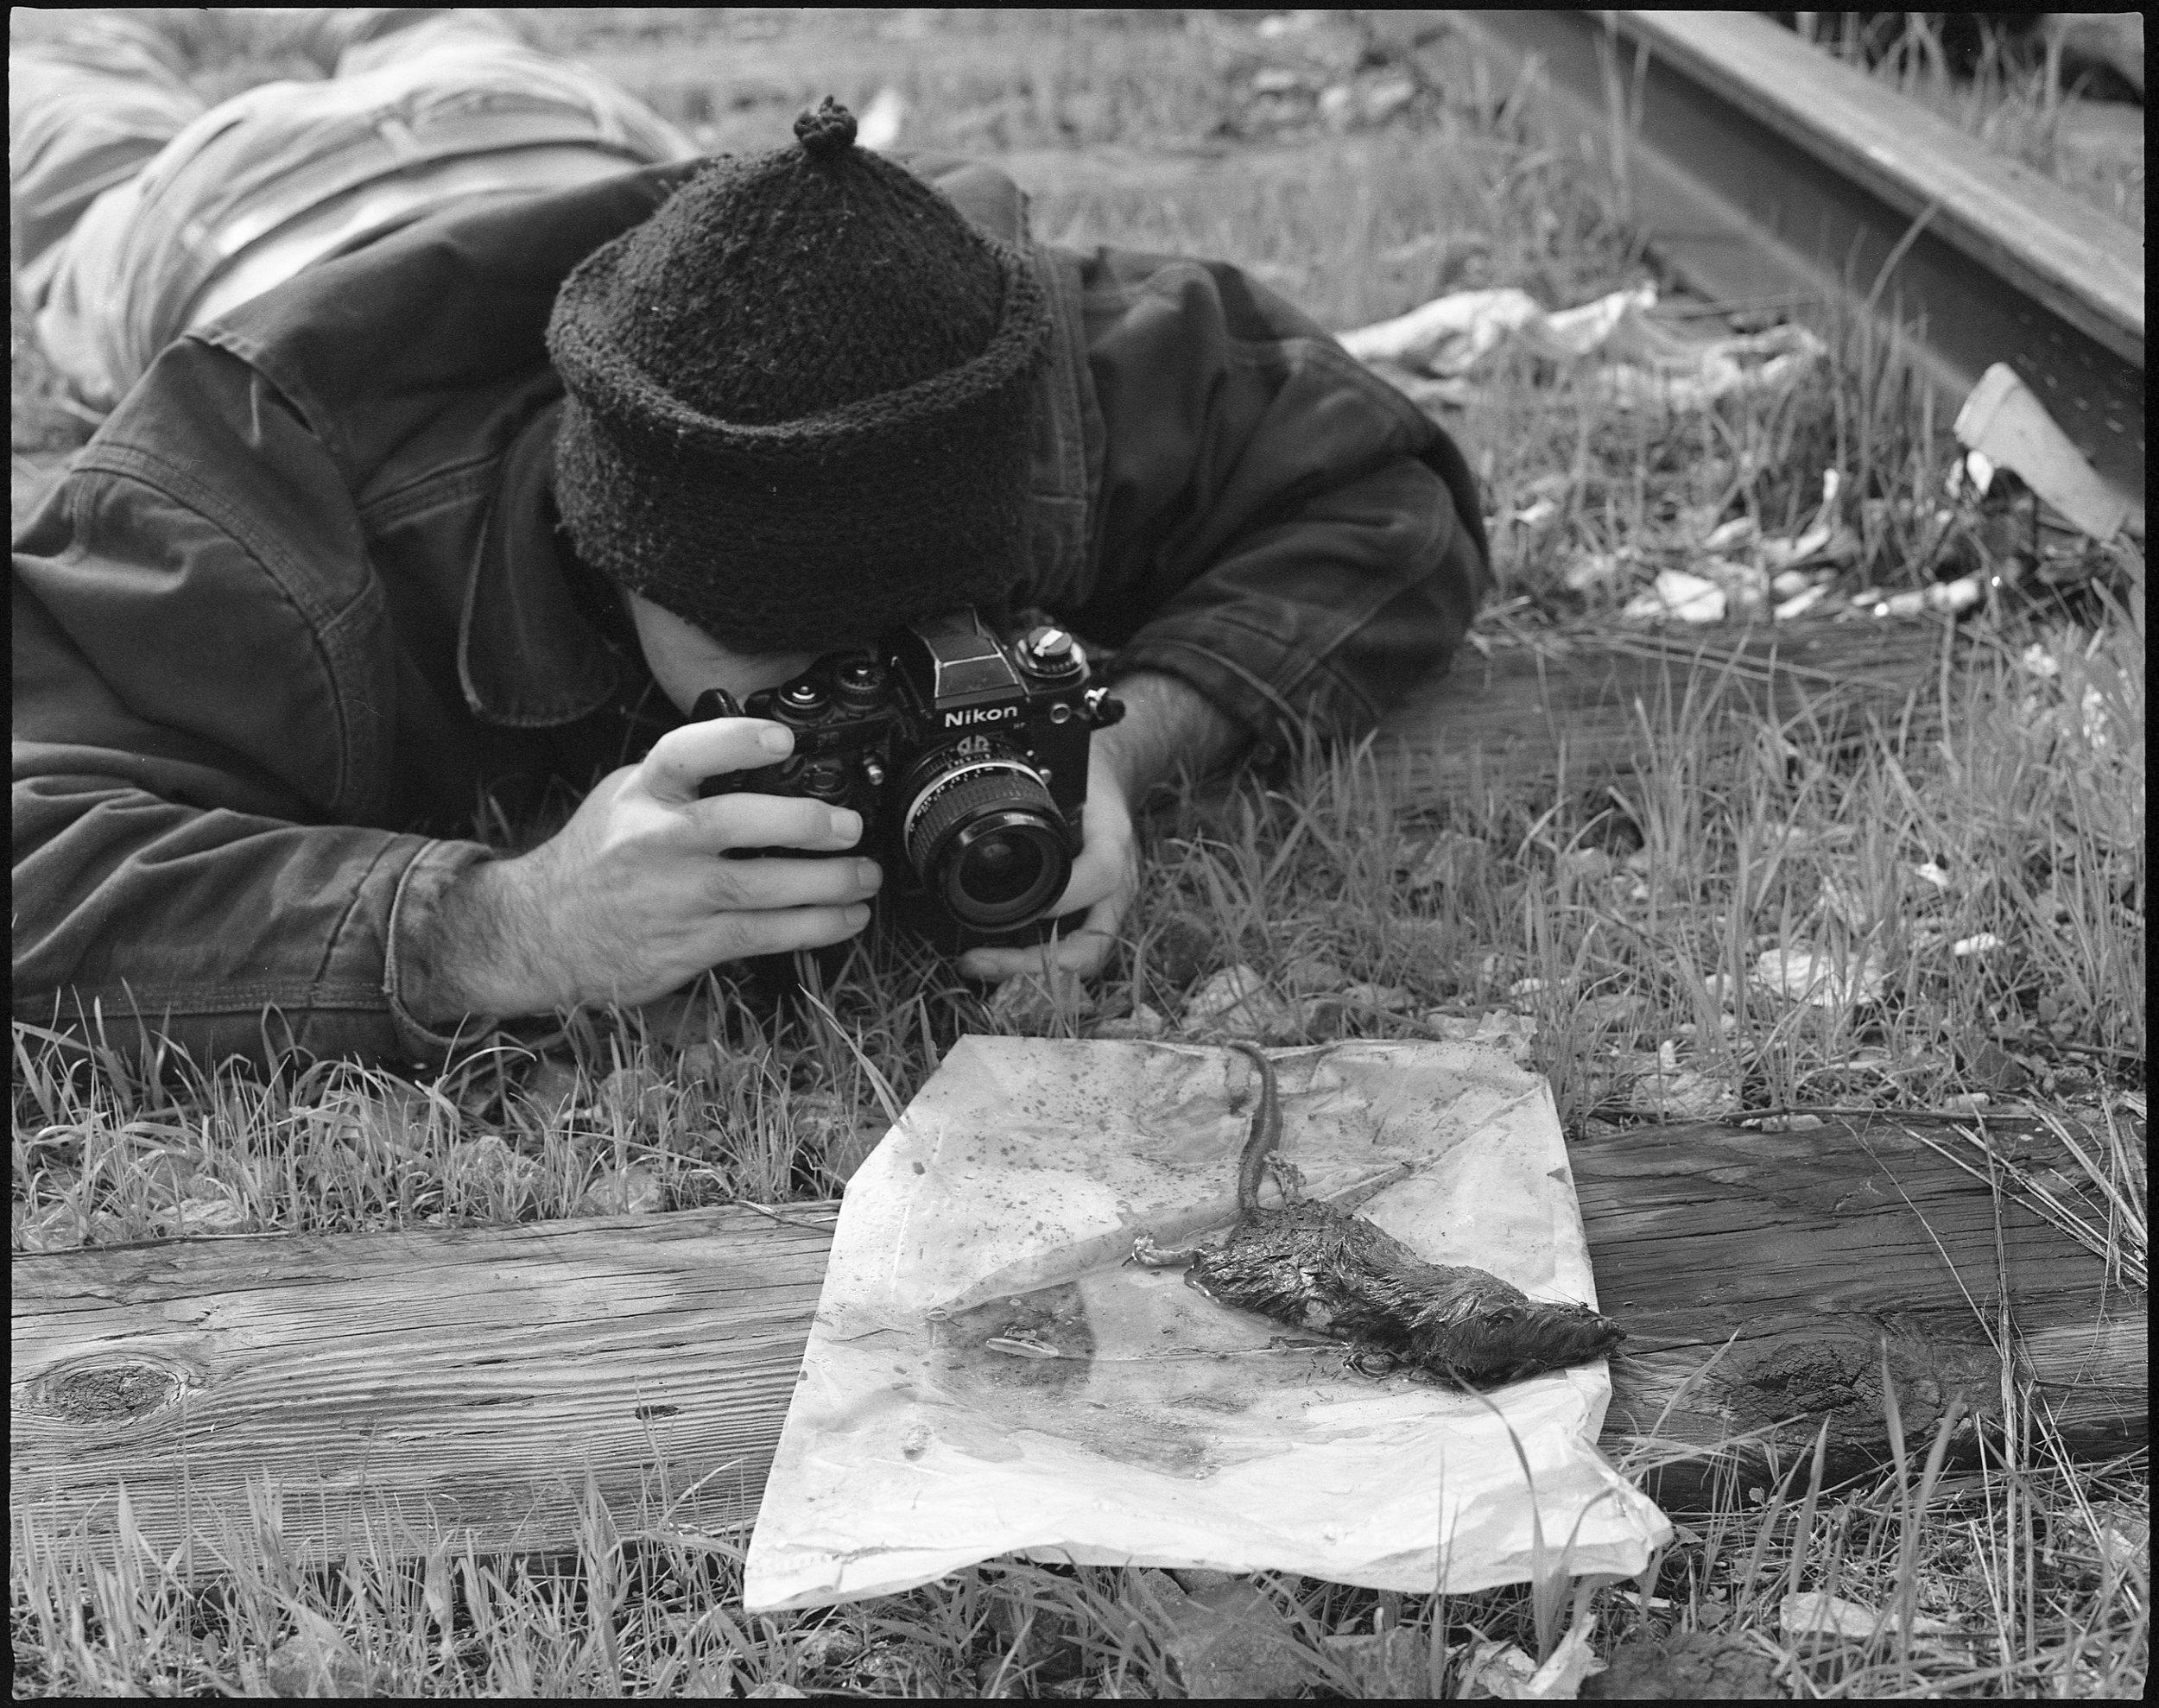 Tobin Yelland, 1995